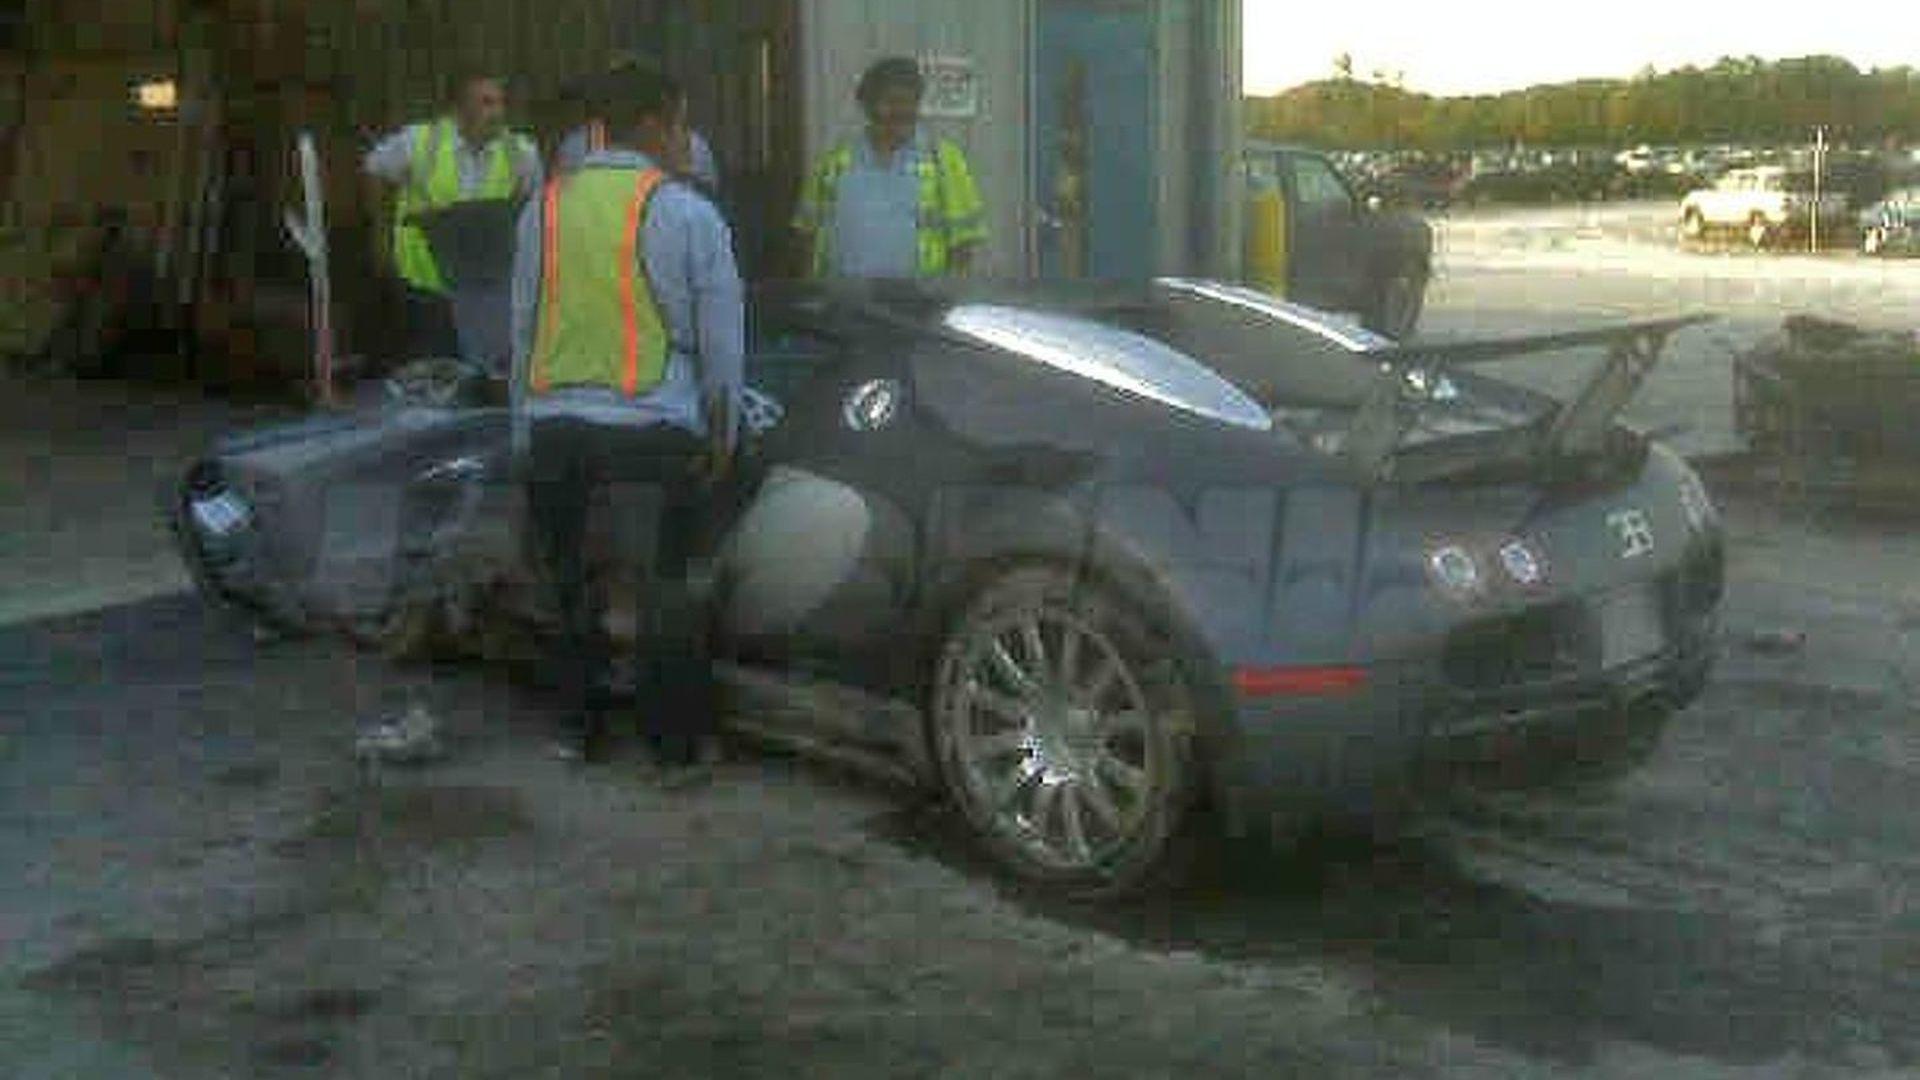 Crashed Bugatti Veyron - The Aftermath